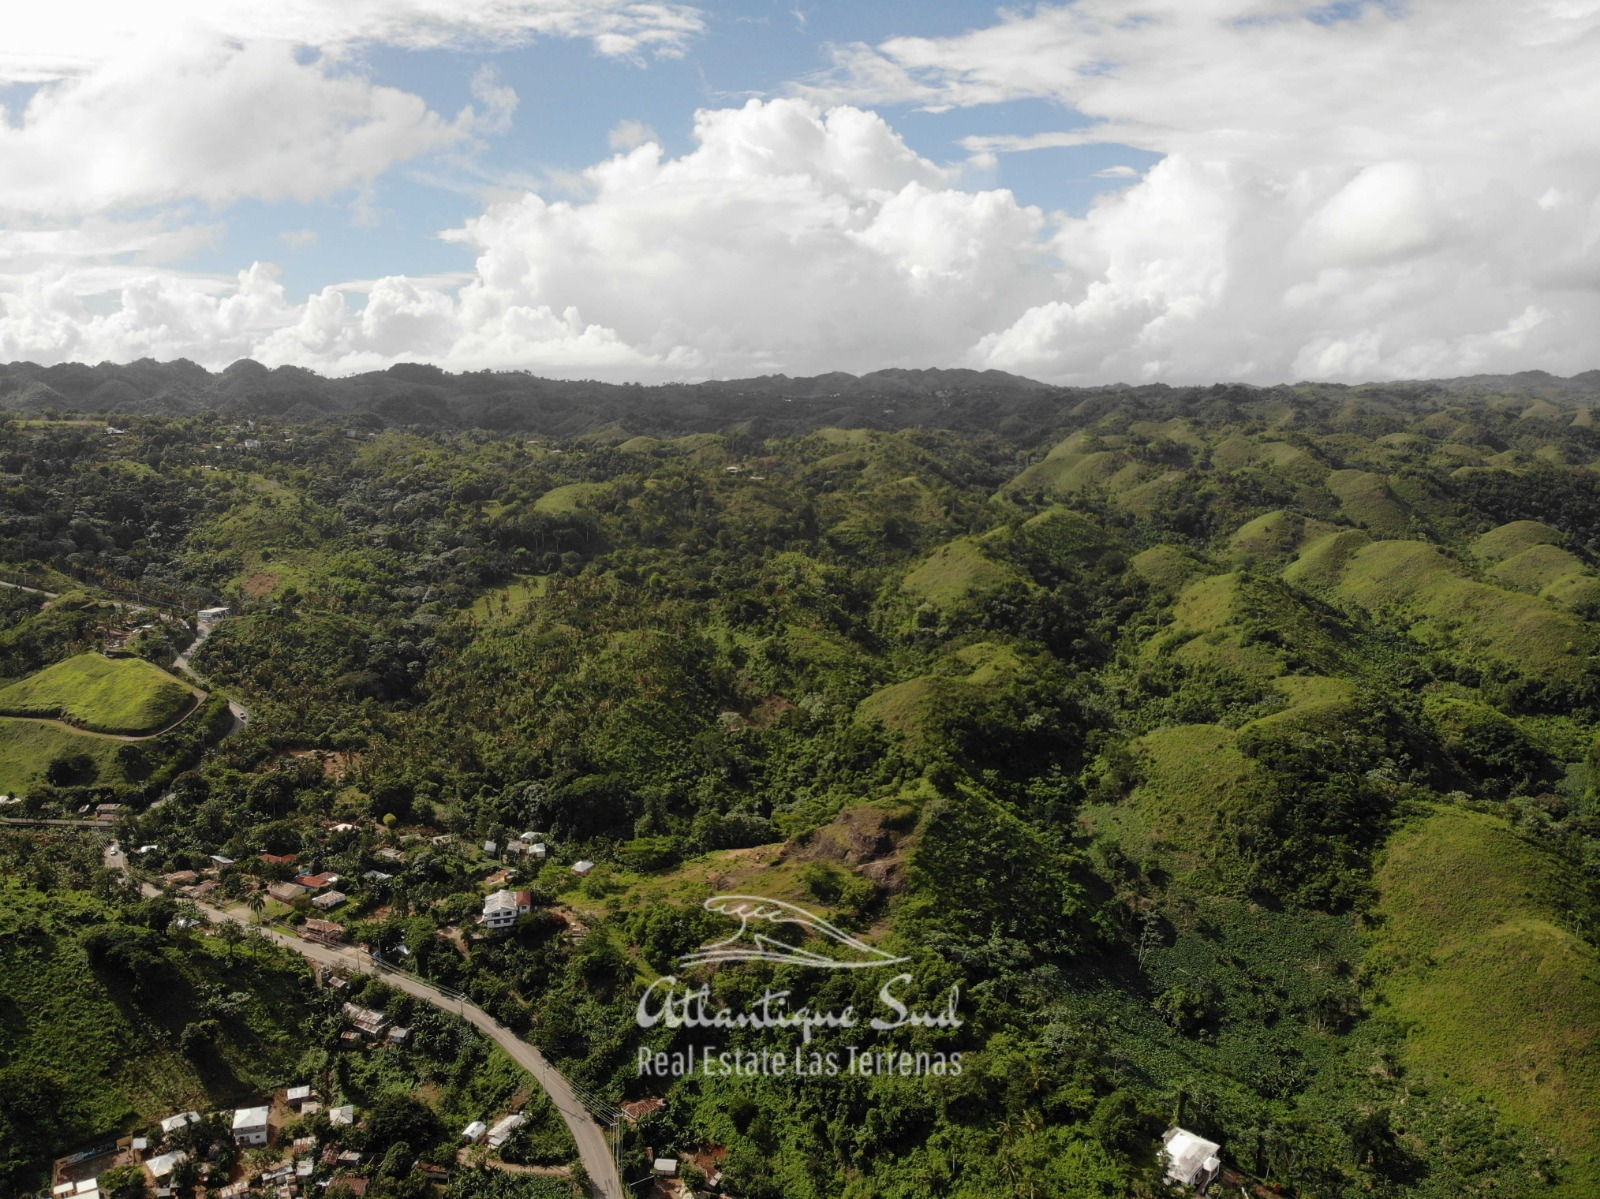 Hillside Lots for sale in Las Terrenas2.jpeg